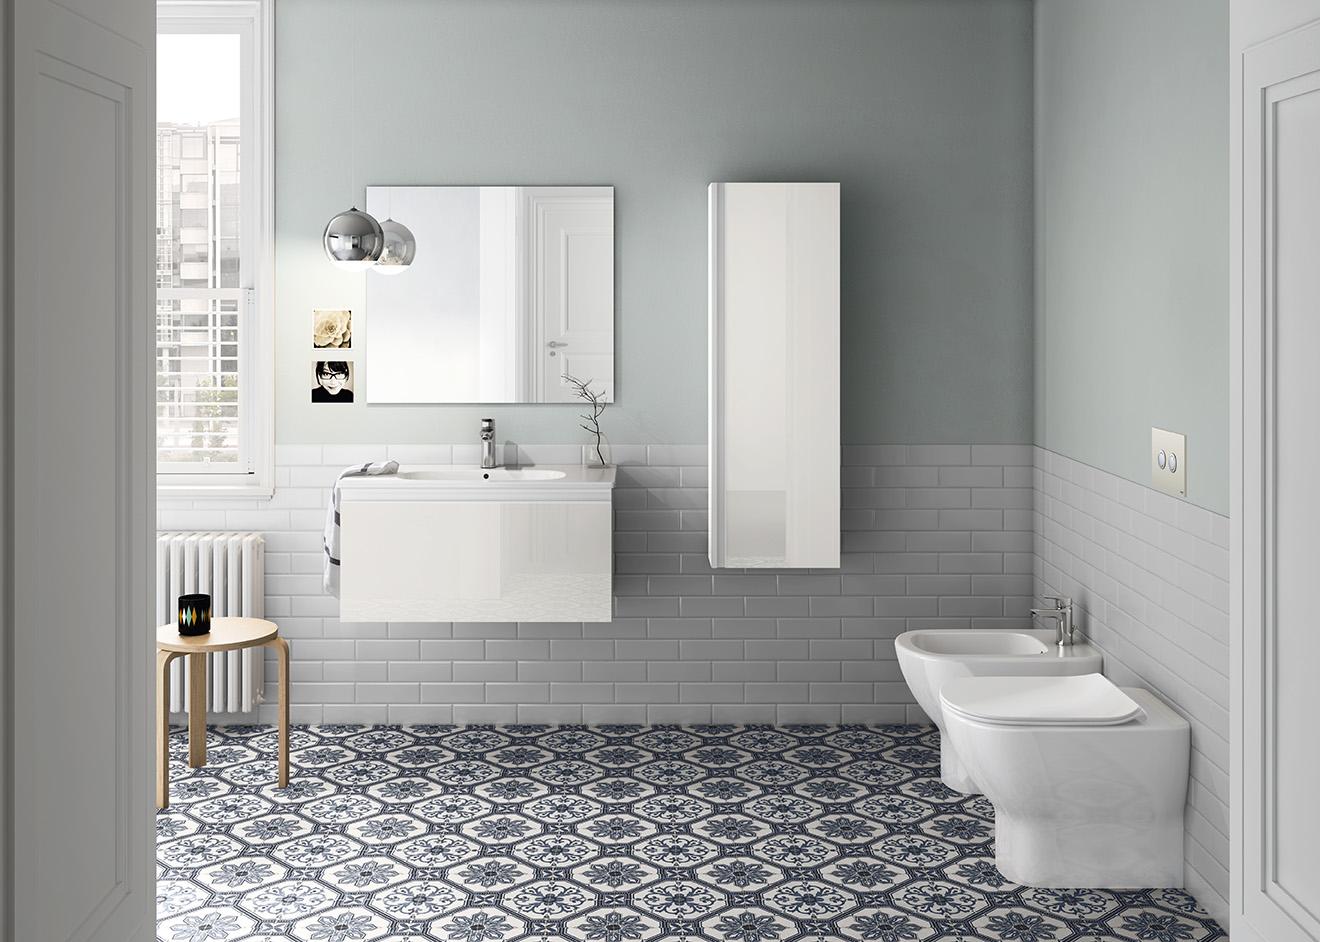 sanitari bagno ideal standard ~ Comarg.com = Lussuoso Design del ...